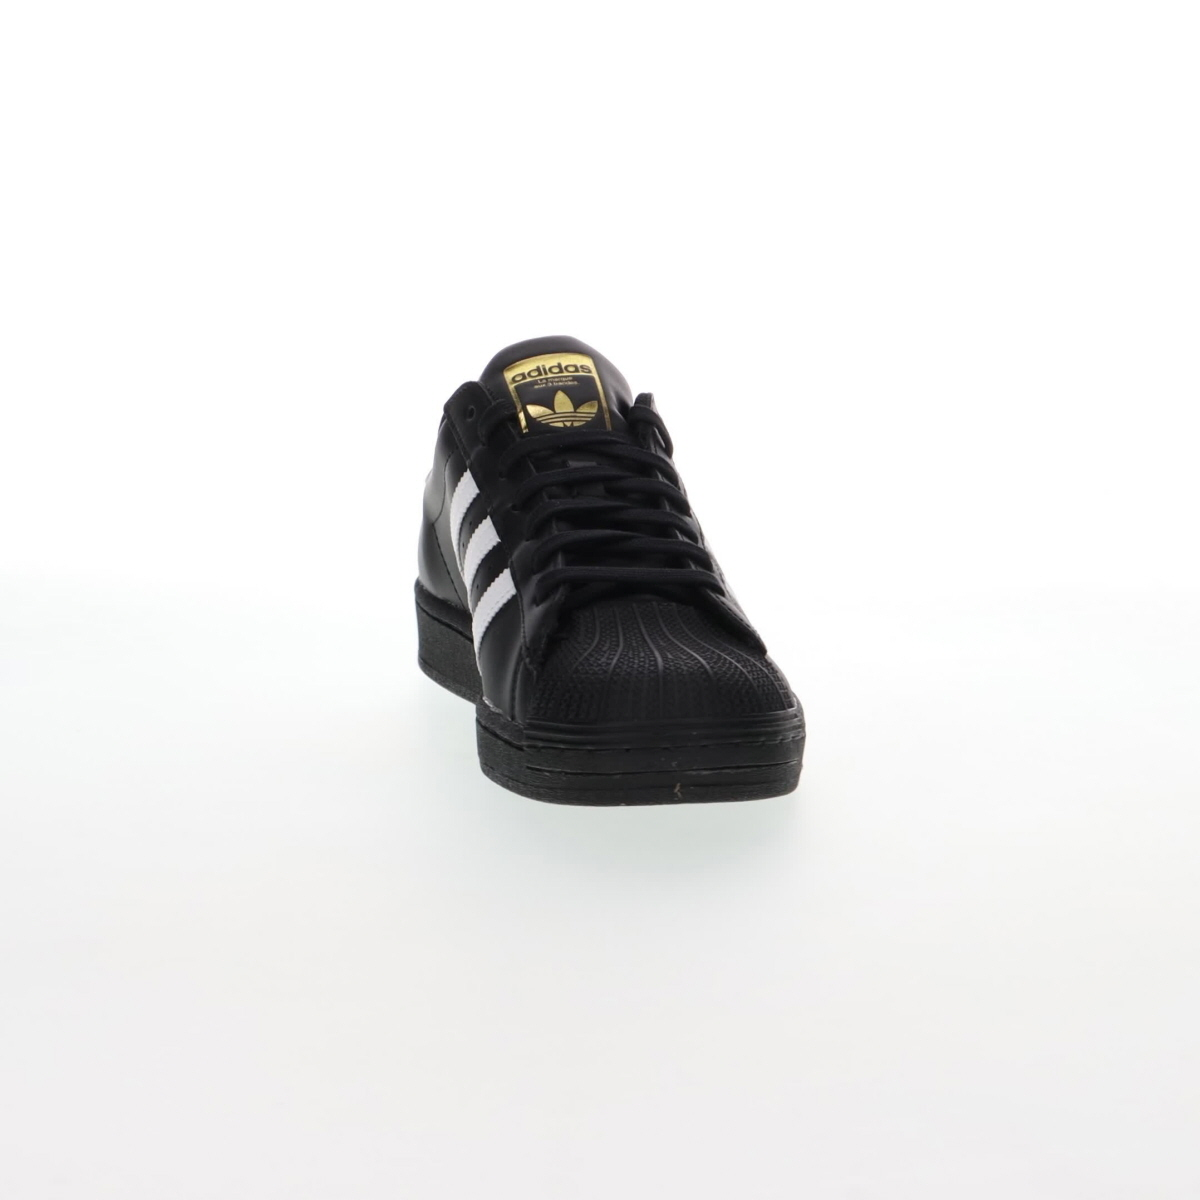 nike ken griffey max 1 preschool shoes free